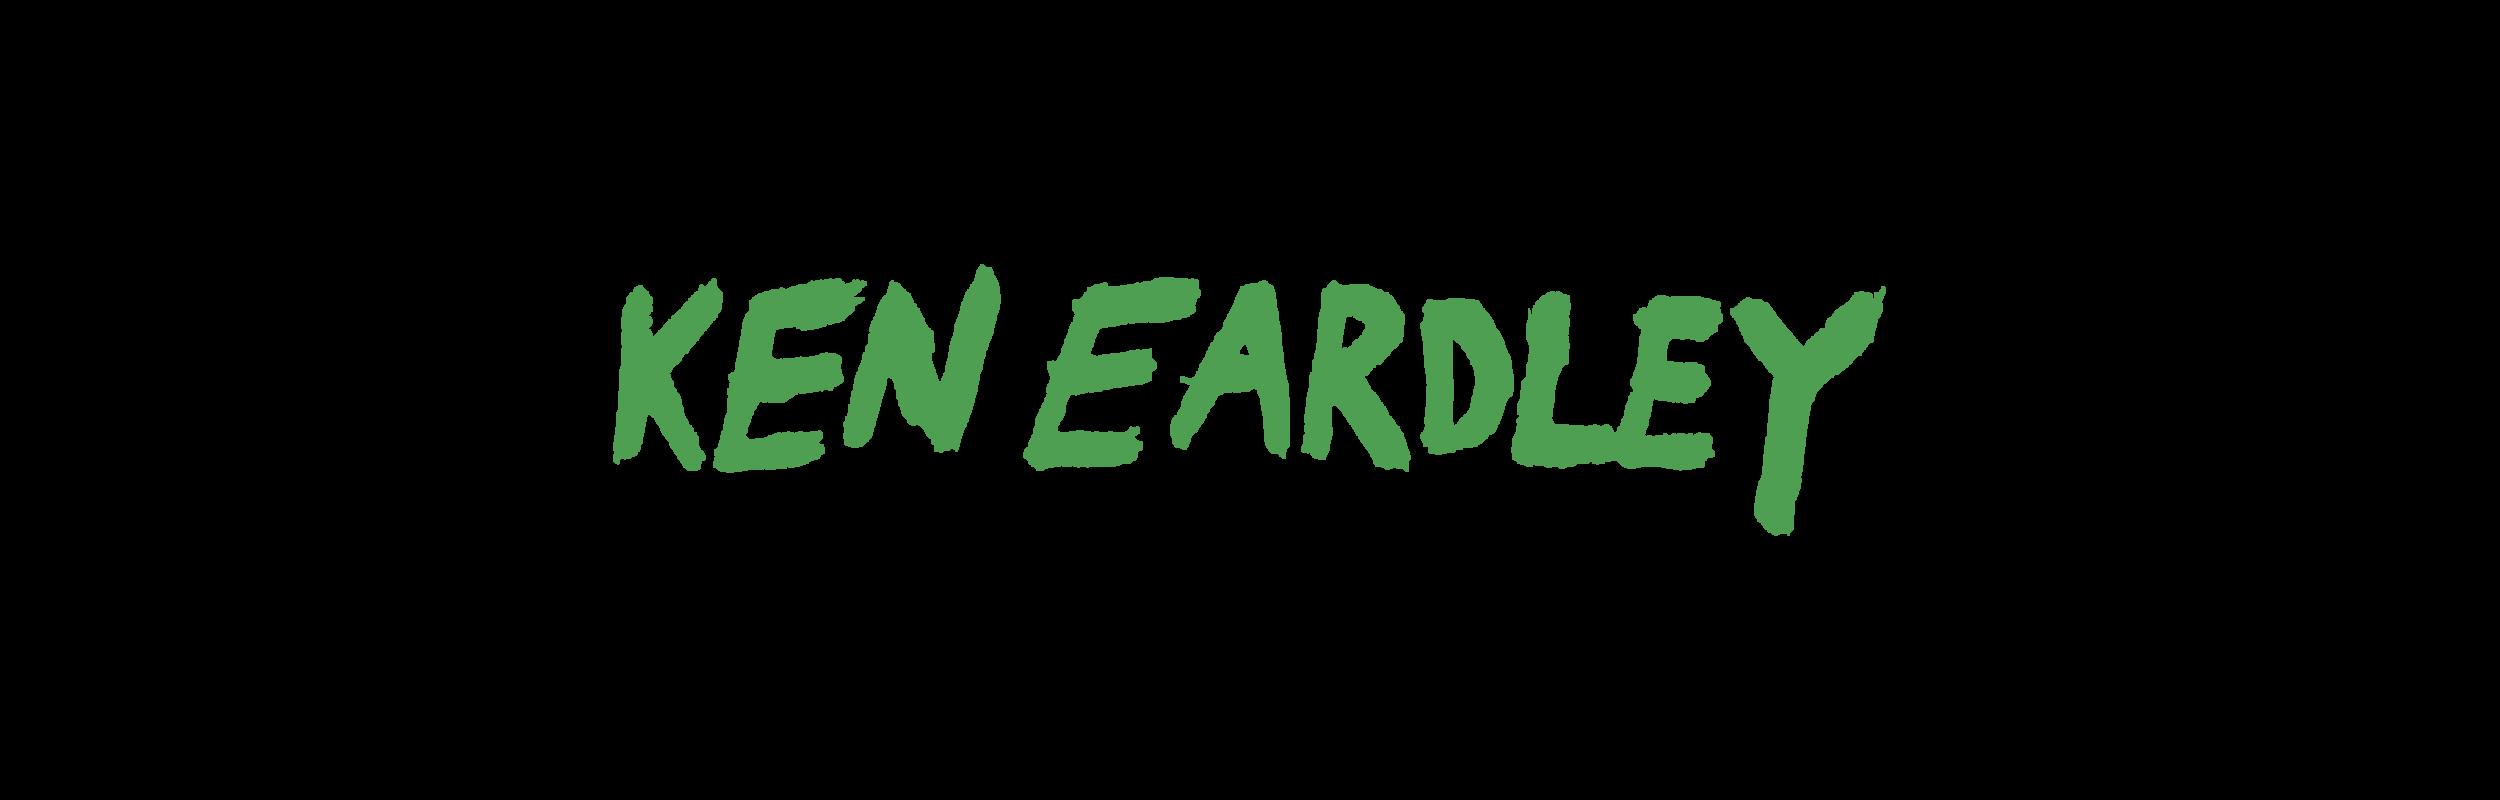 KEN - Ken Eardley logo - Version 3 - green font_300dpi.tif copy.png